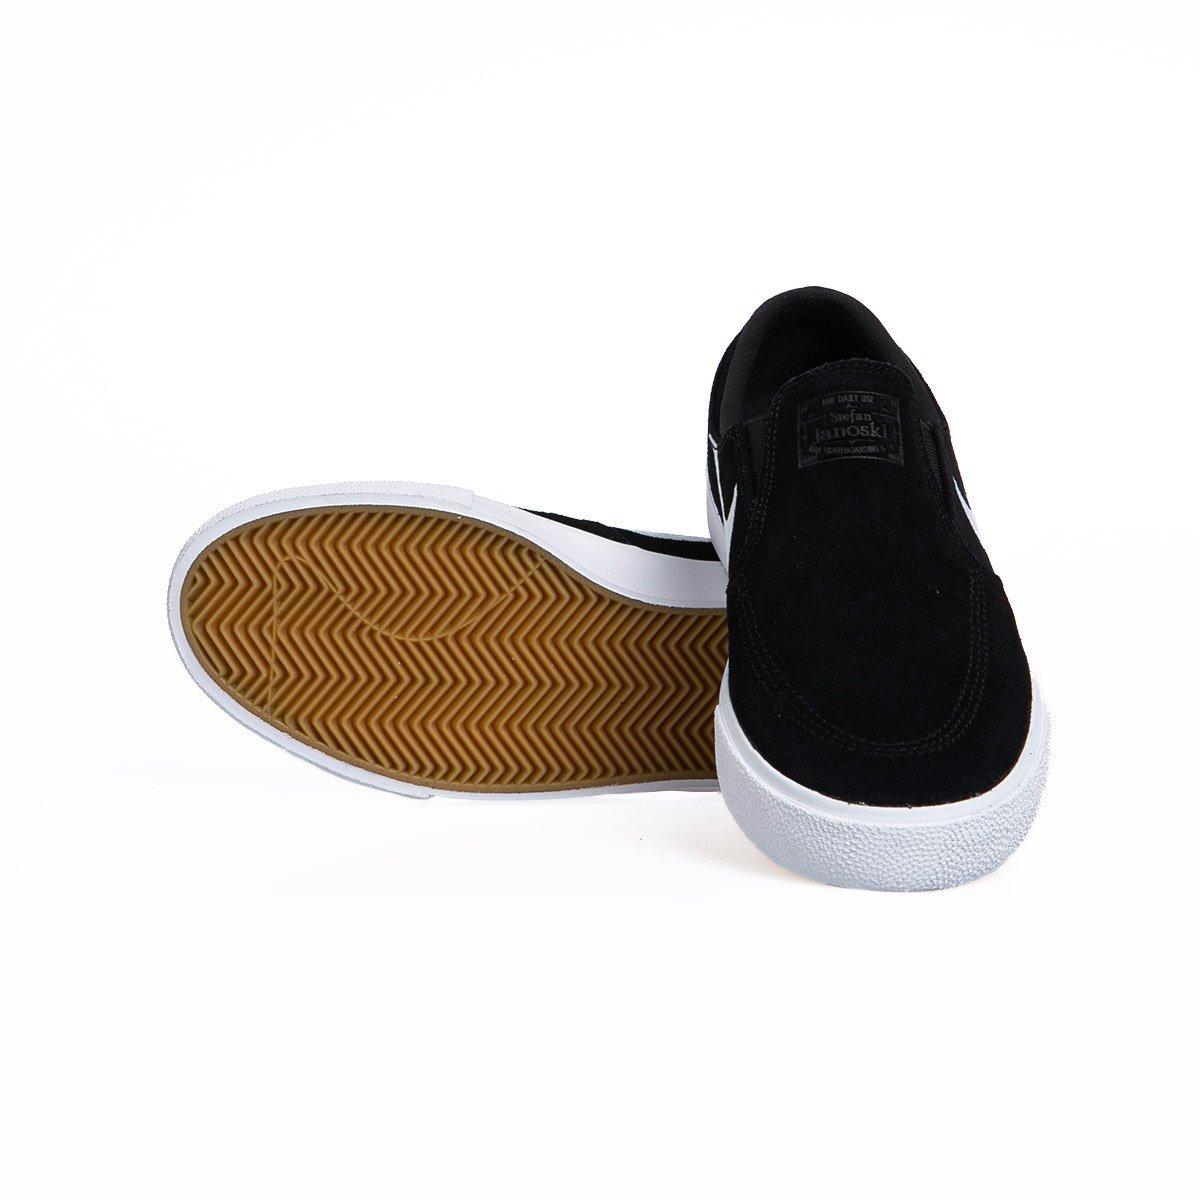 Sneakers buty Nike SB Zoom Stefan Janoski Slip RM blackwhite white (AT8899 002)